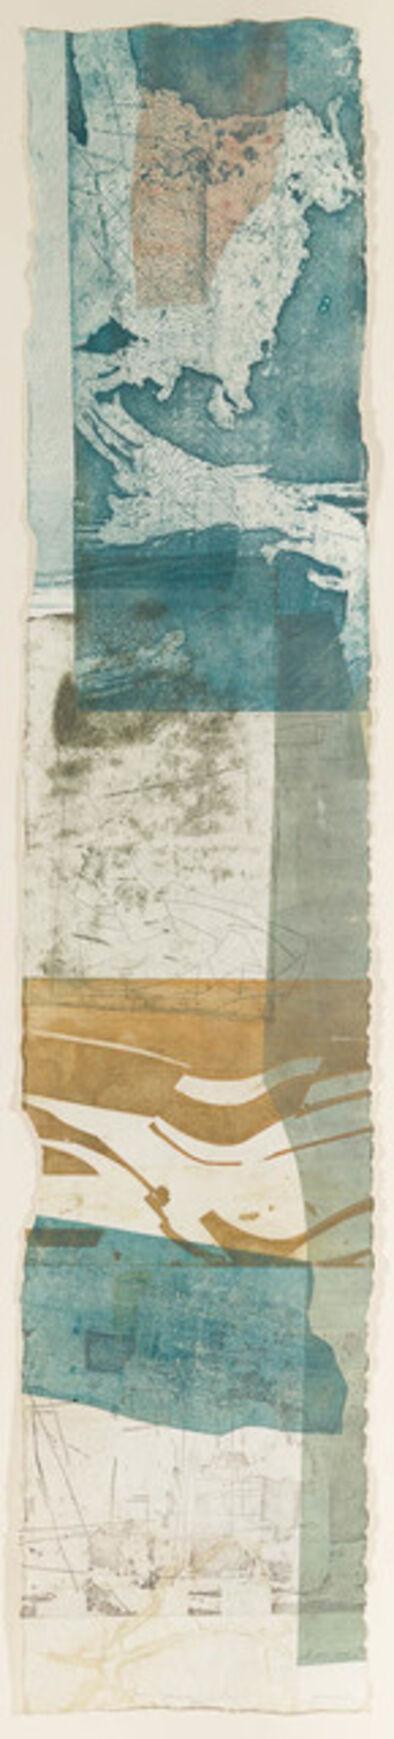 Jeremy Gardiner, 'Seacombe, July', 2012